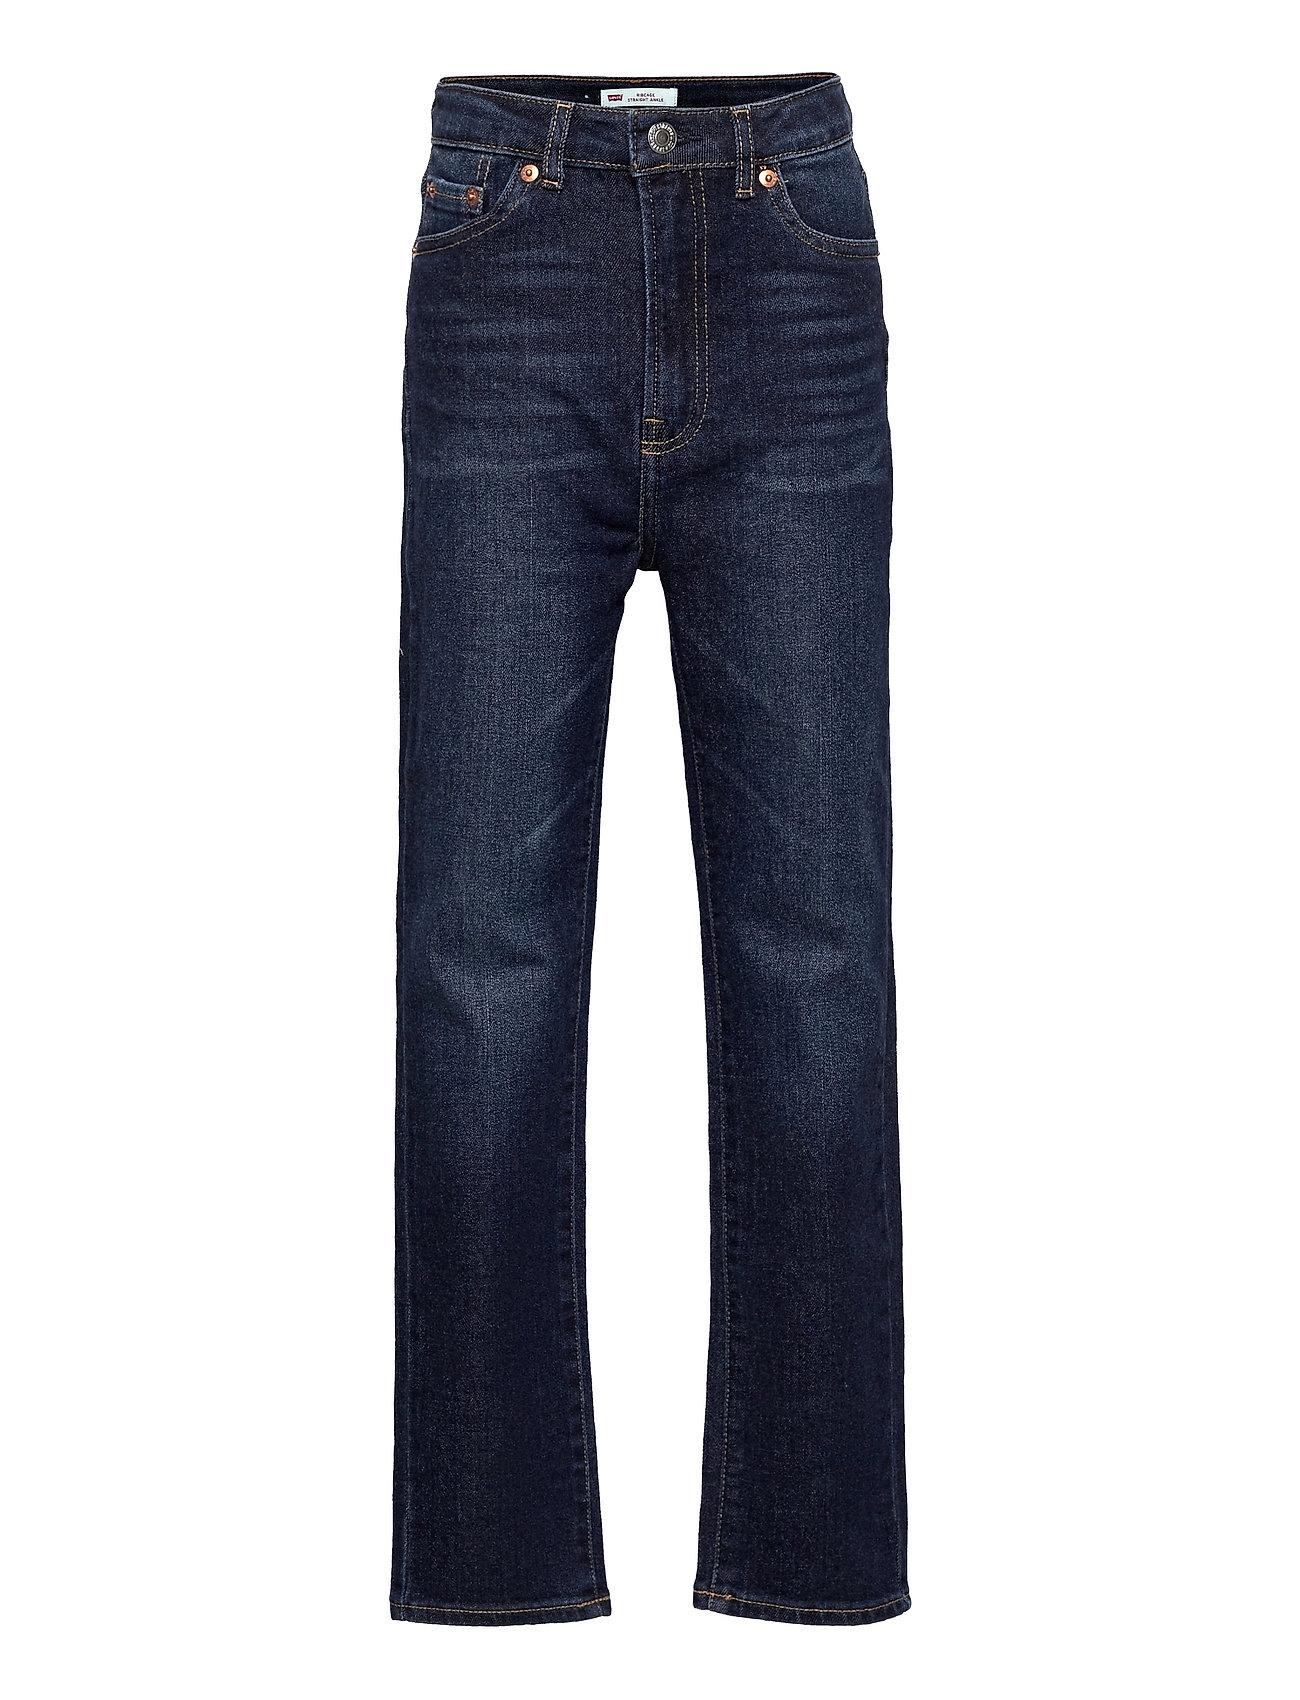 Lvg Ribcage Denim Pant Jeans Blå Levi's